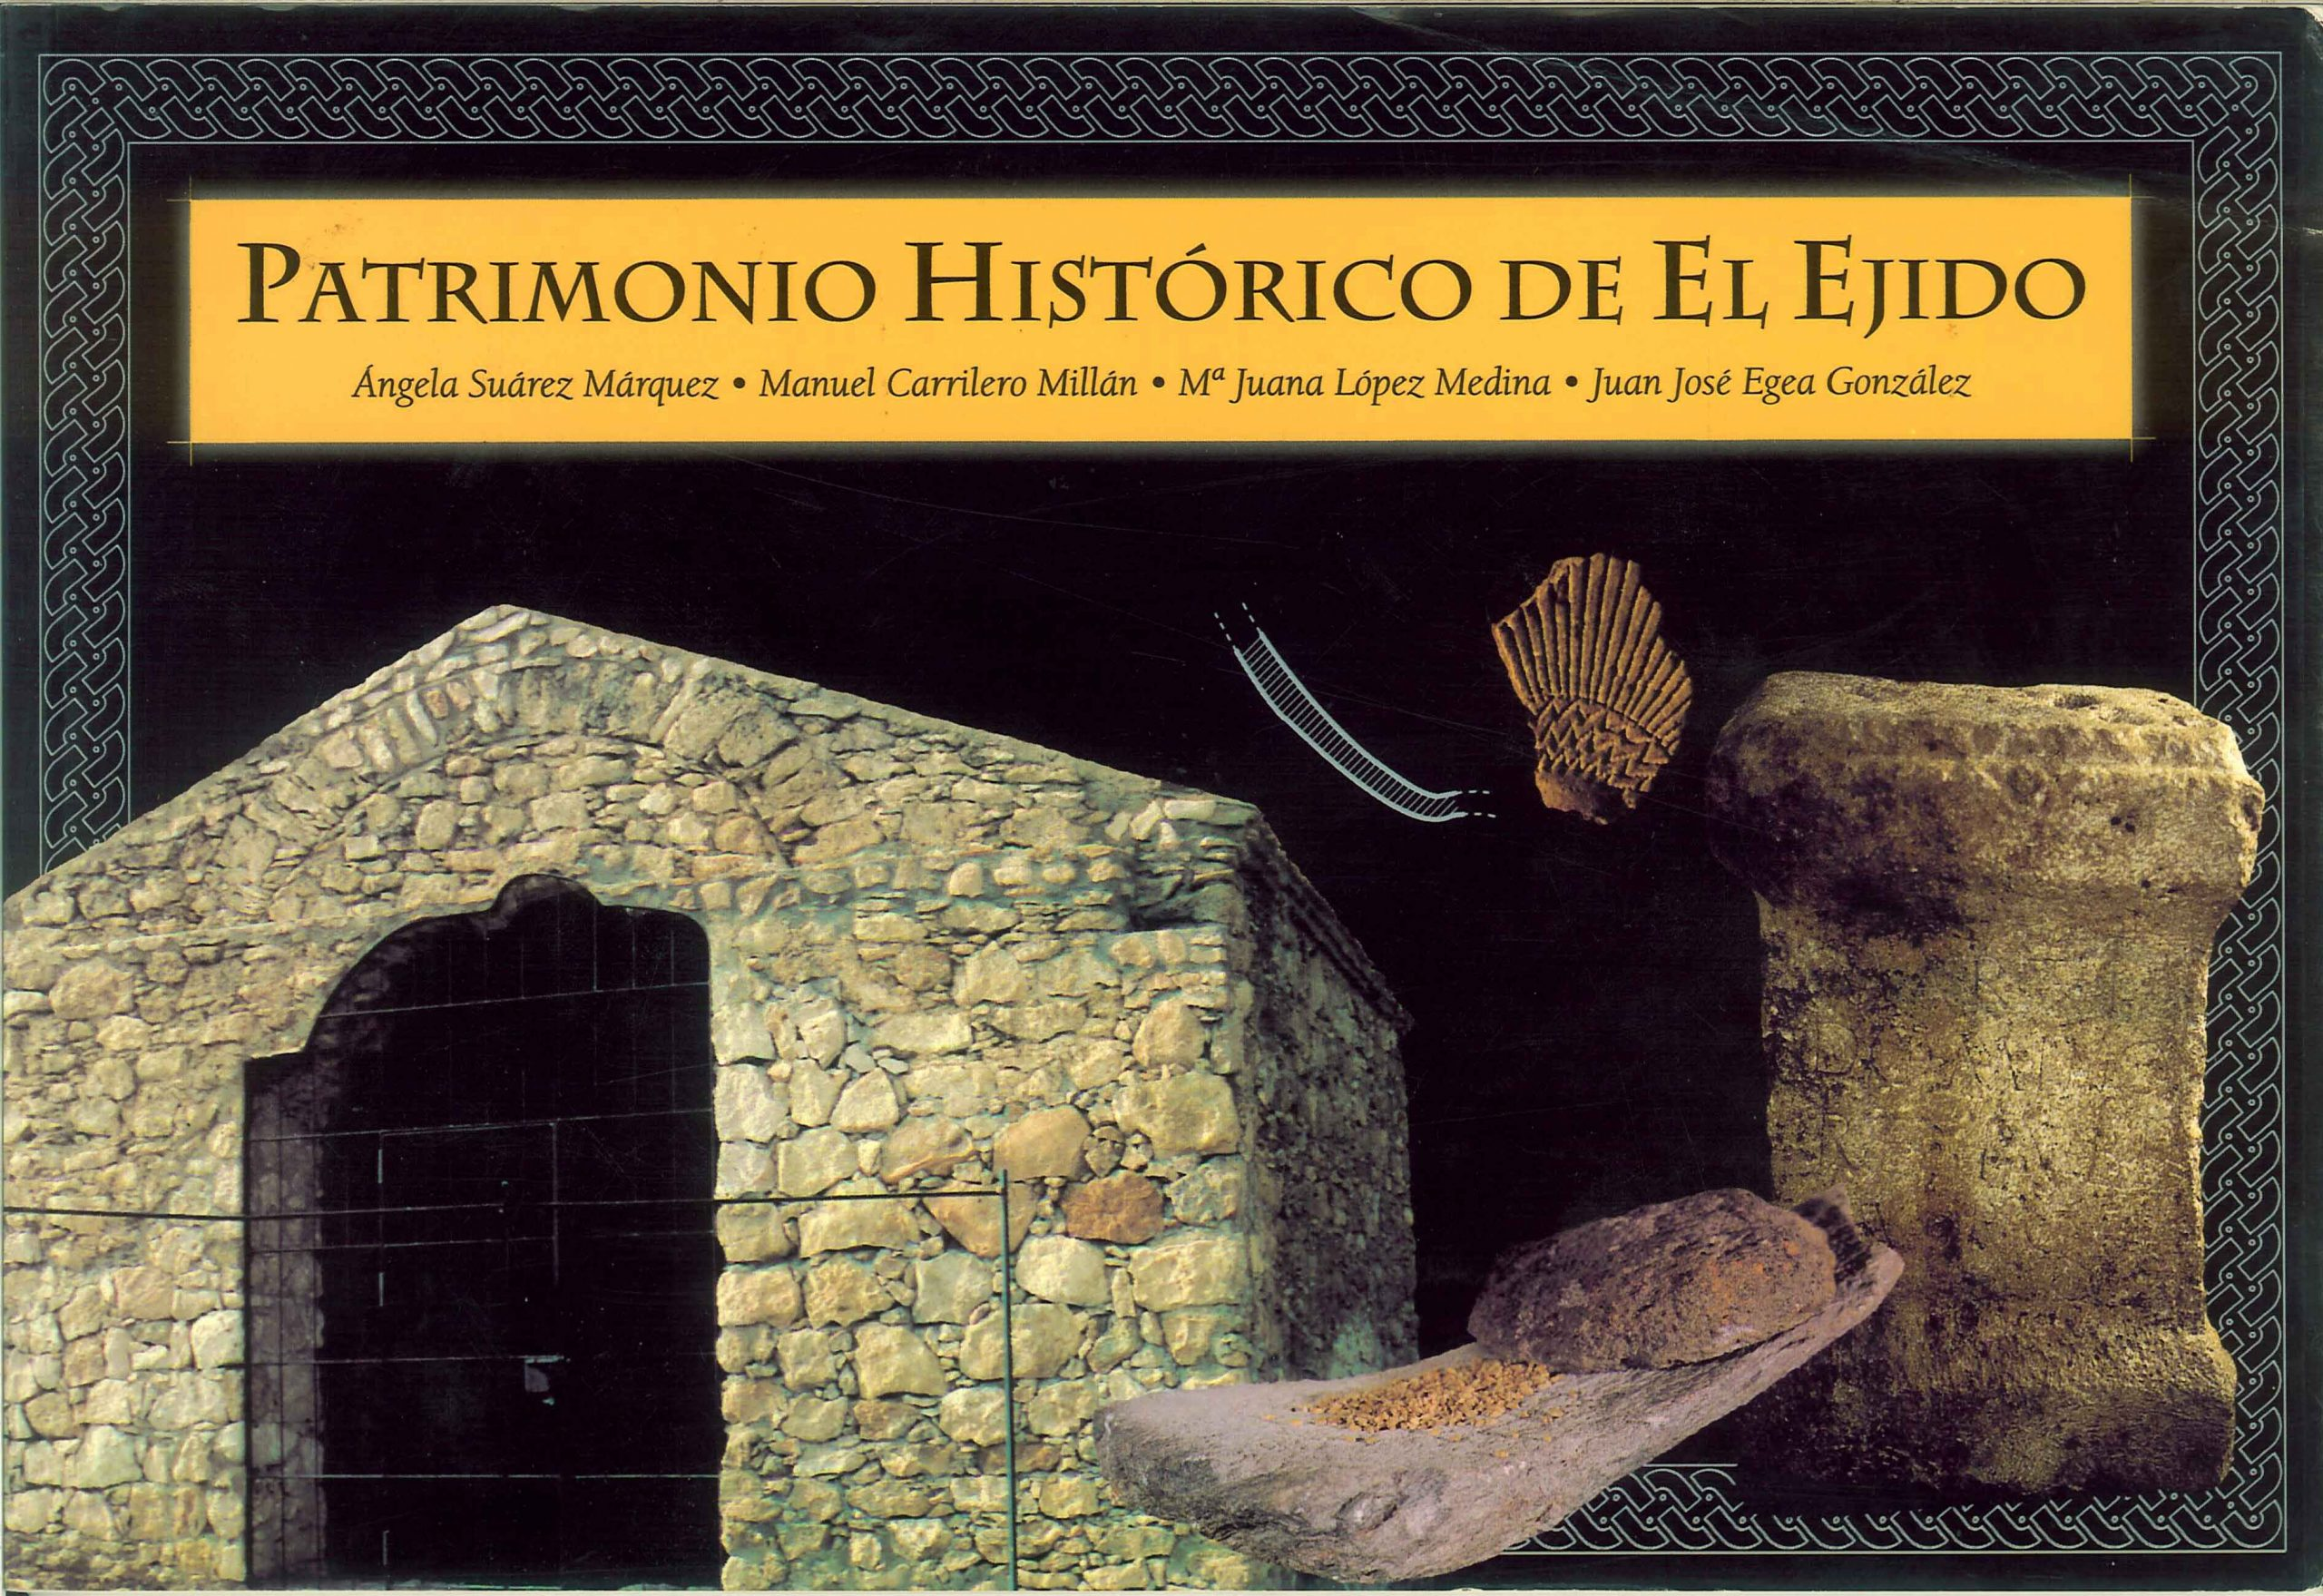 Patrimonio Histórico de El Ejido